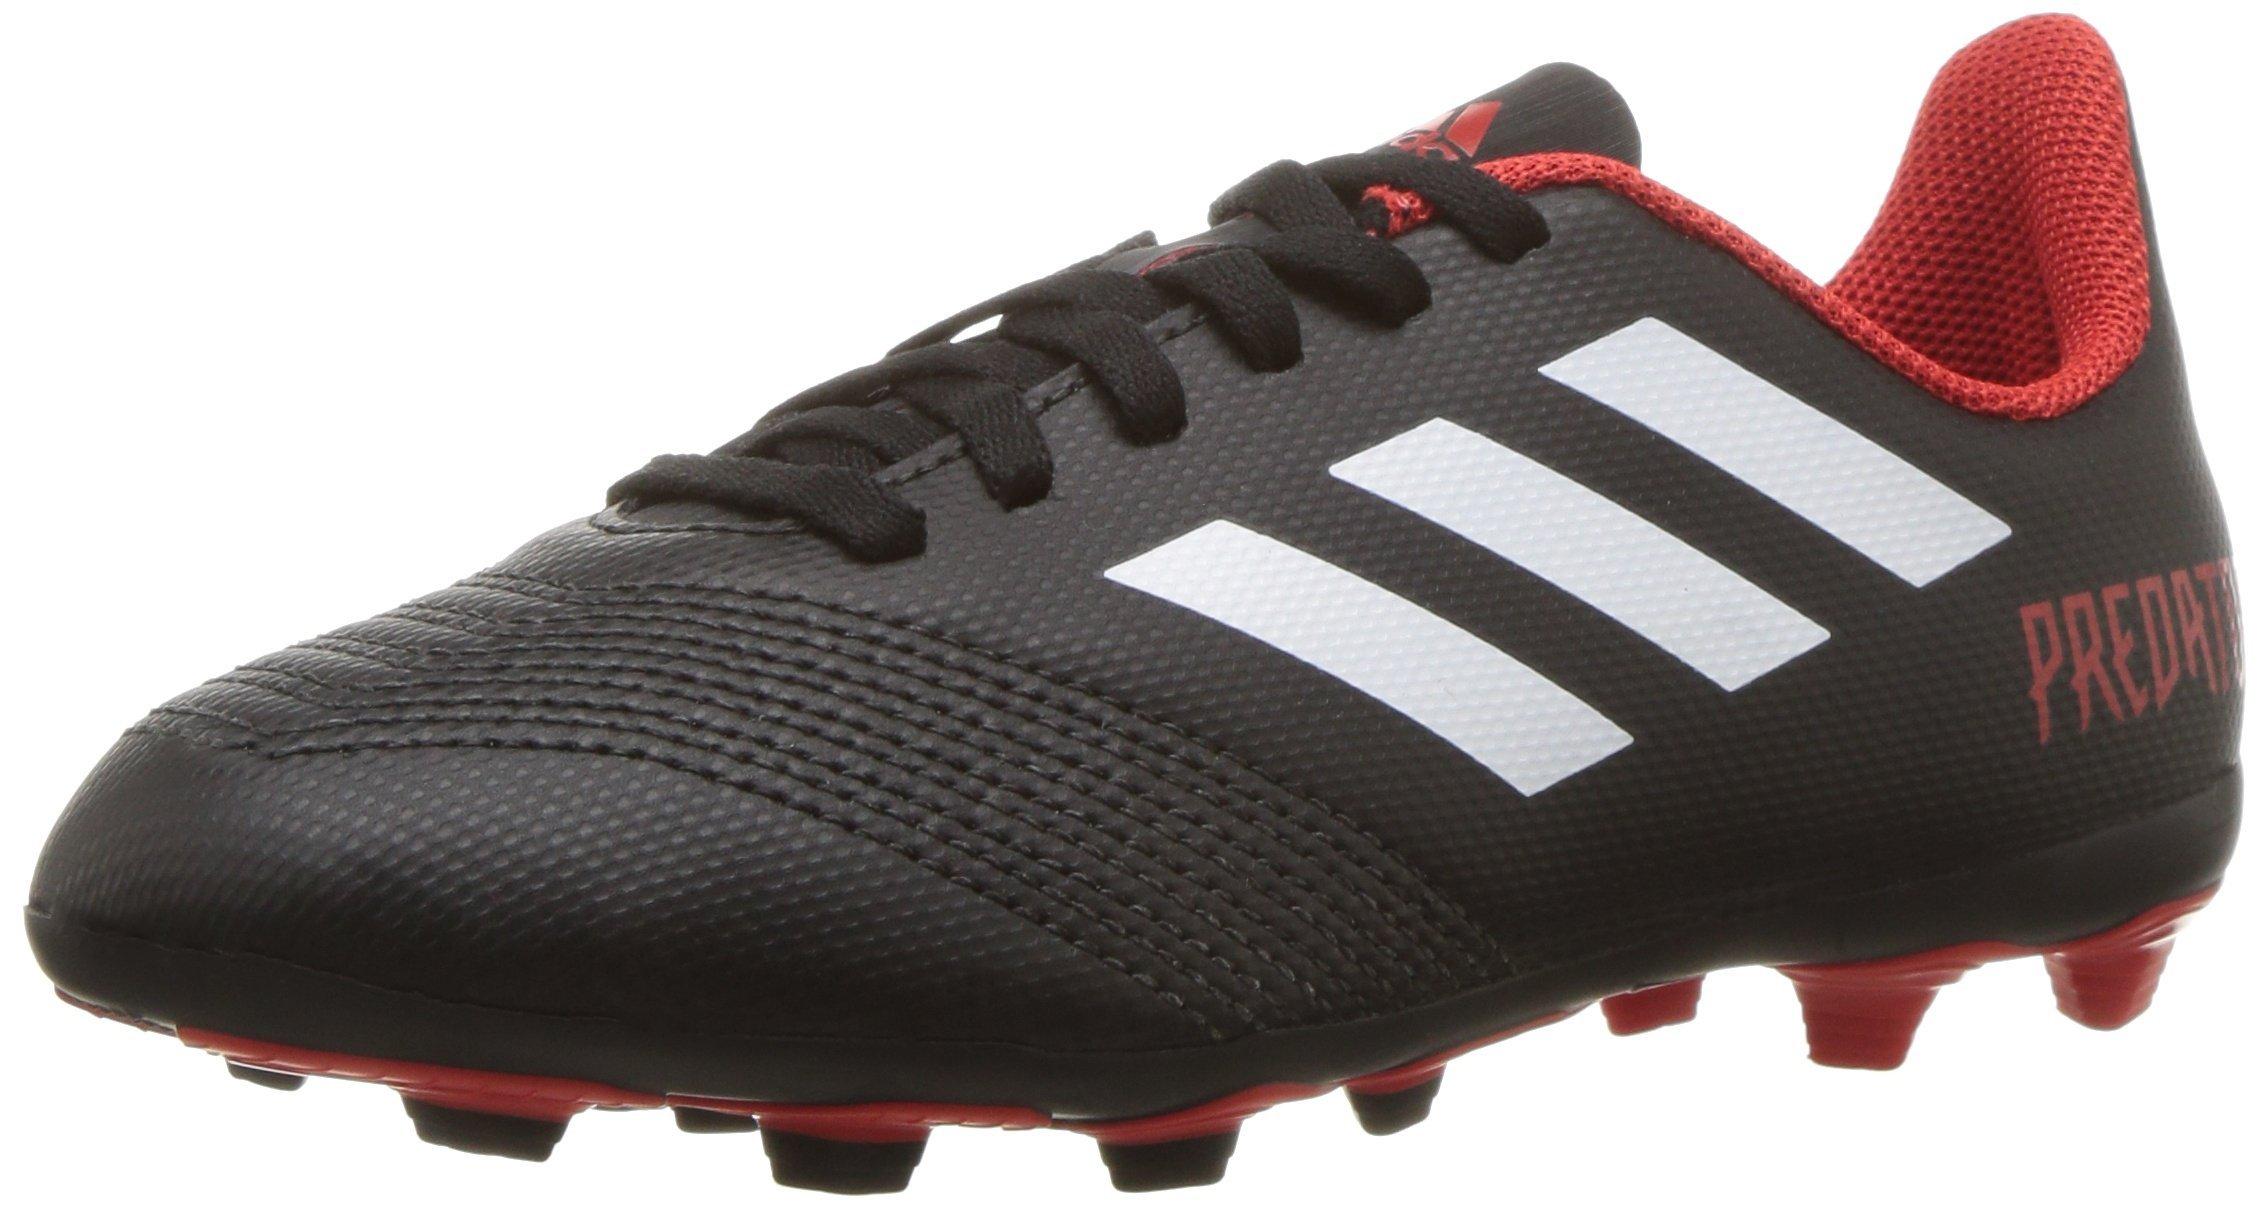 adidas Unisex Predator 18.4 Firm Ground Soccer Shoe, Black/White/red, 2 M US Little Kid